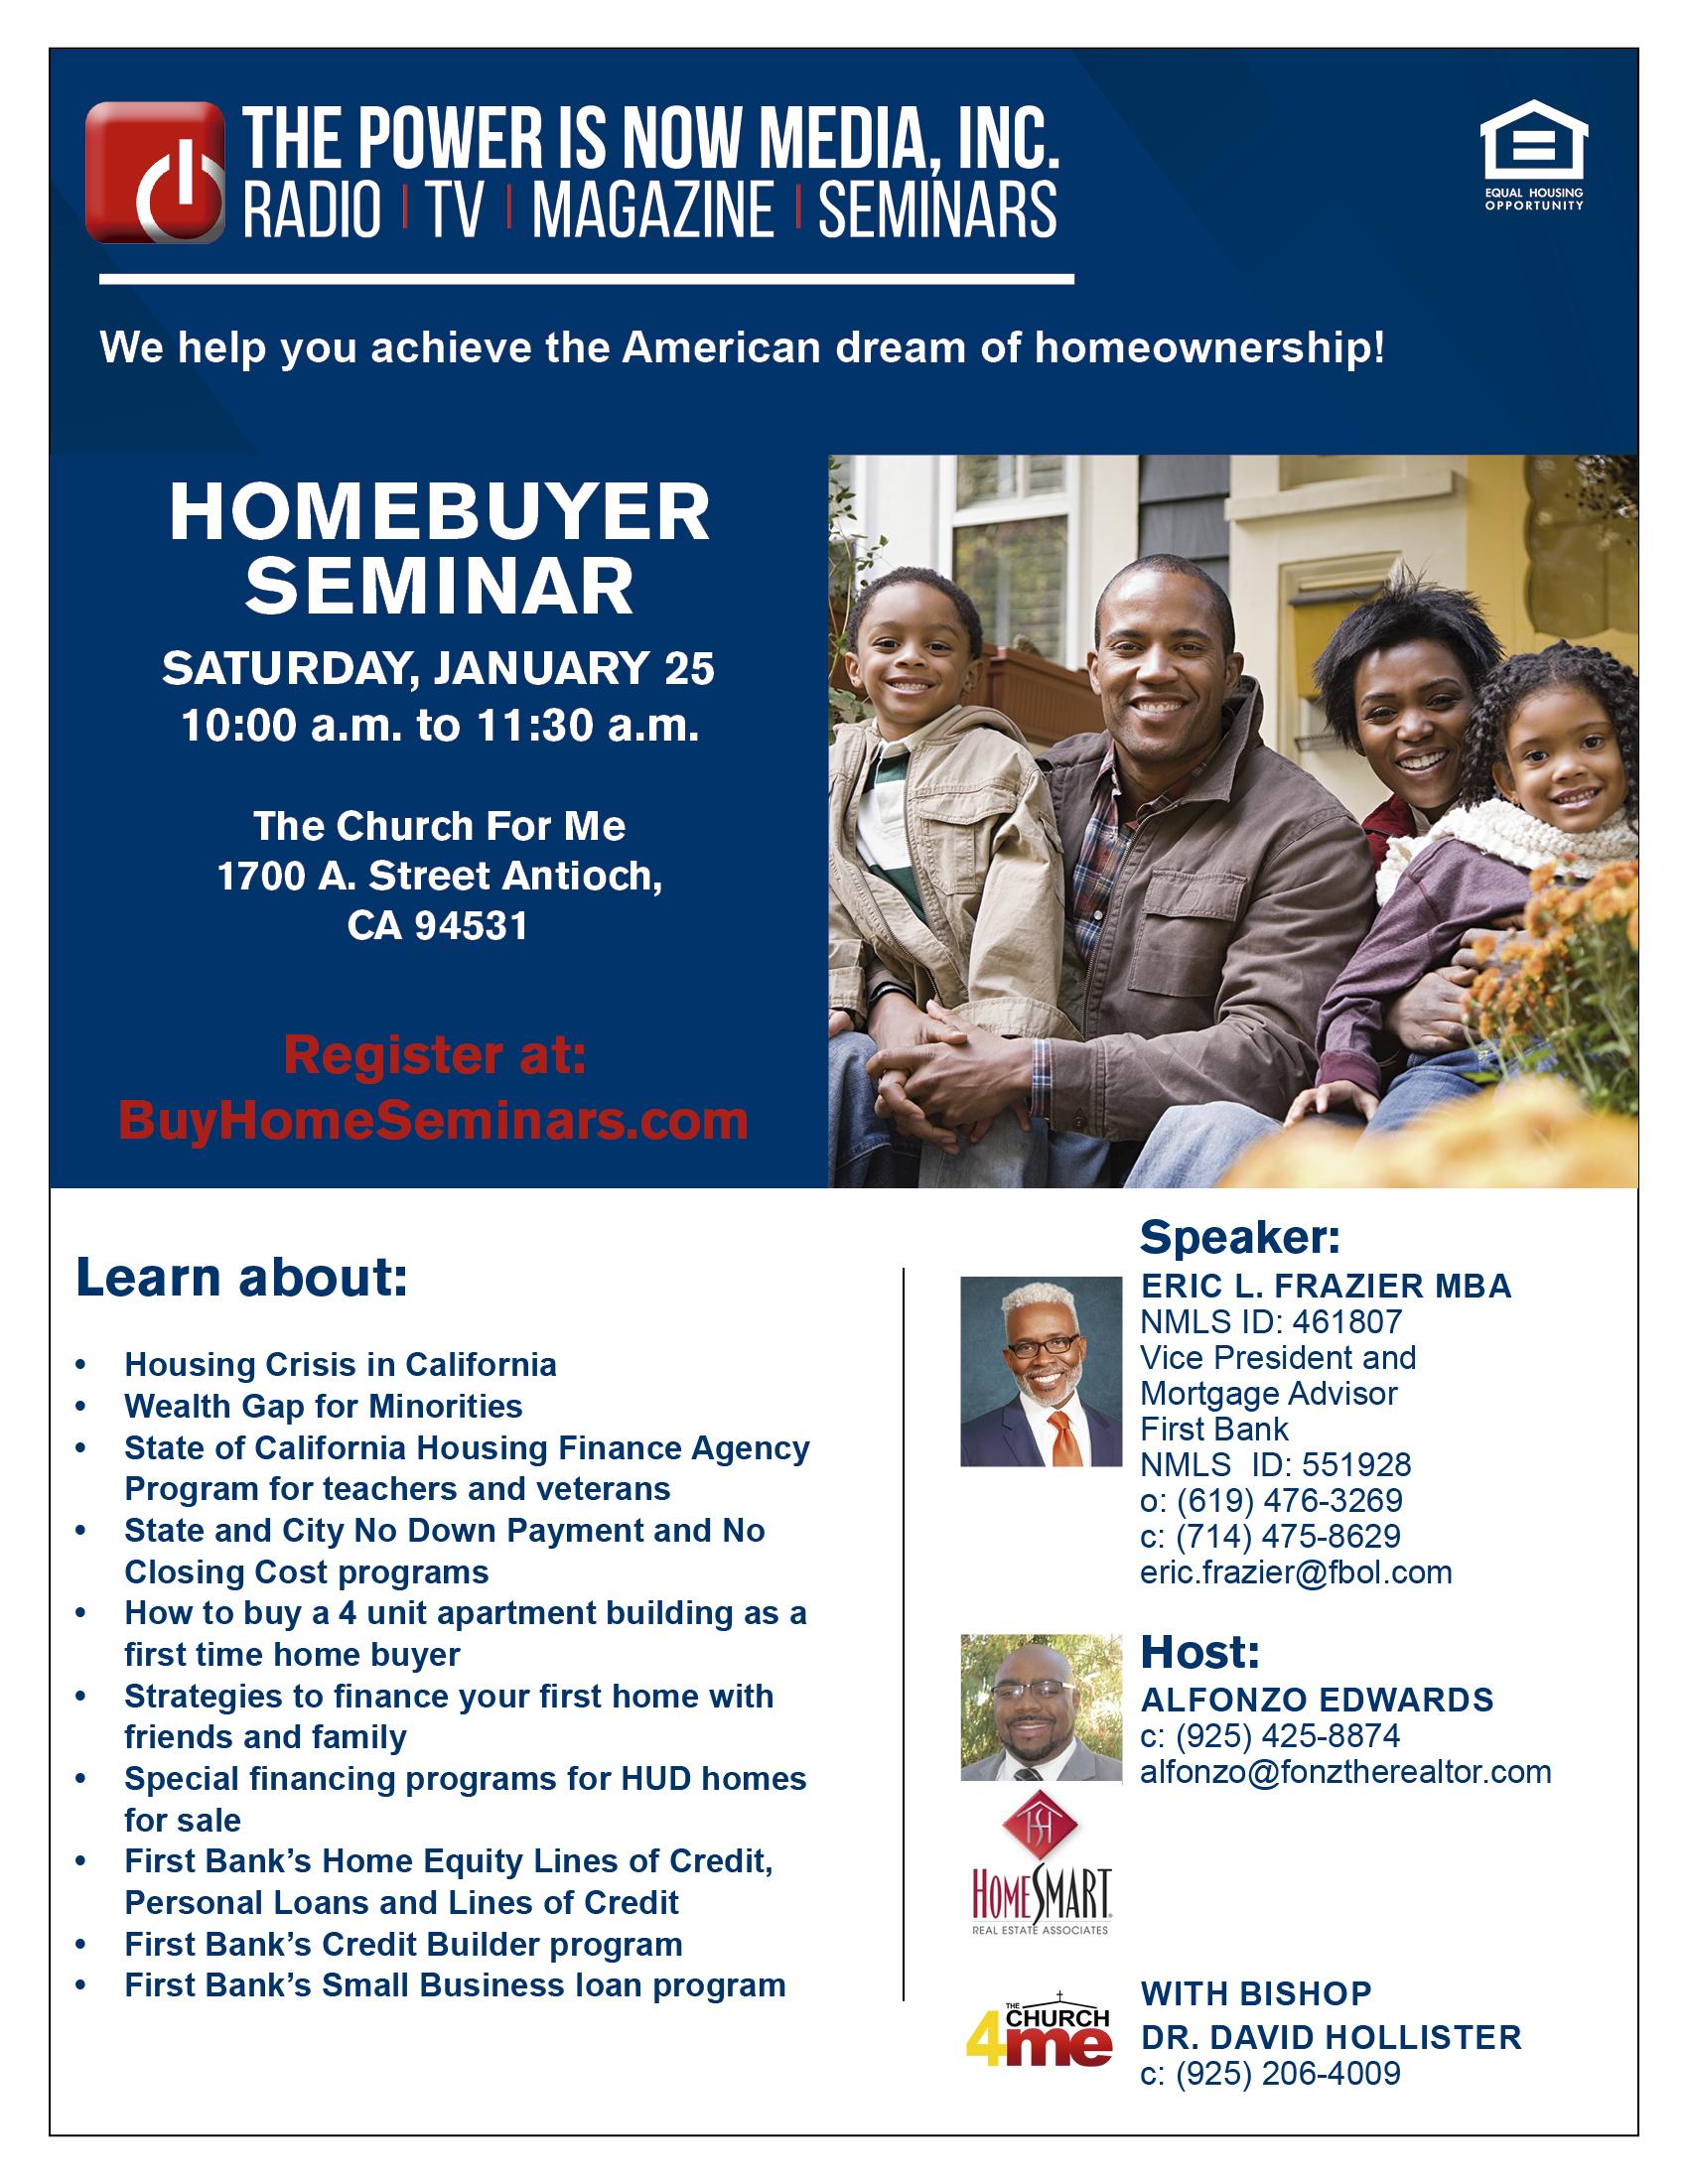 Homebuyer Seminar – The Church For Me